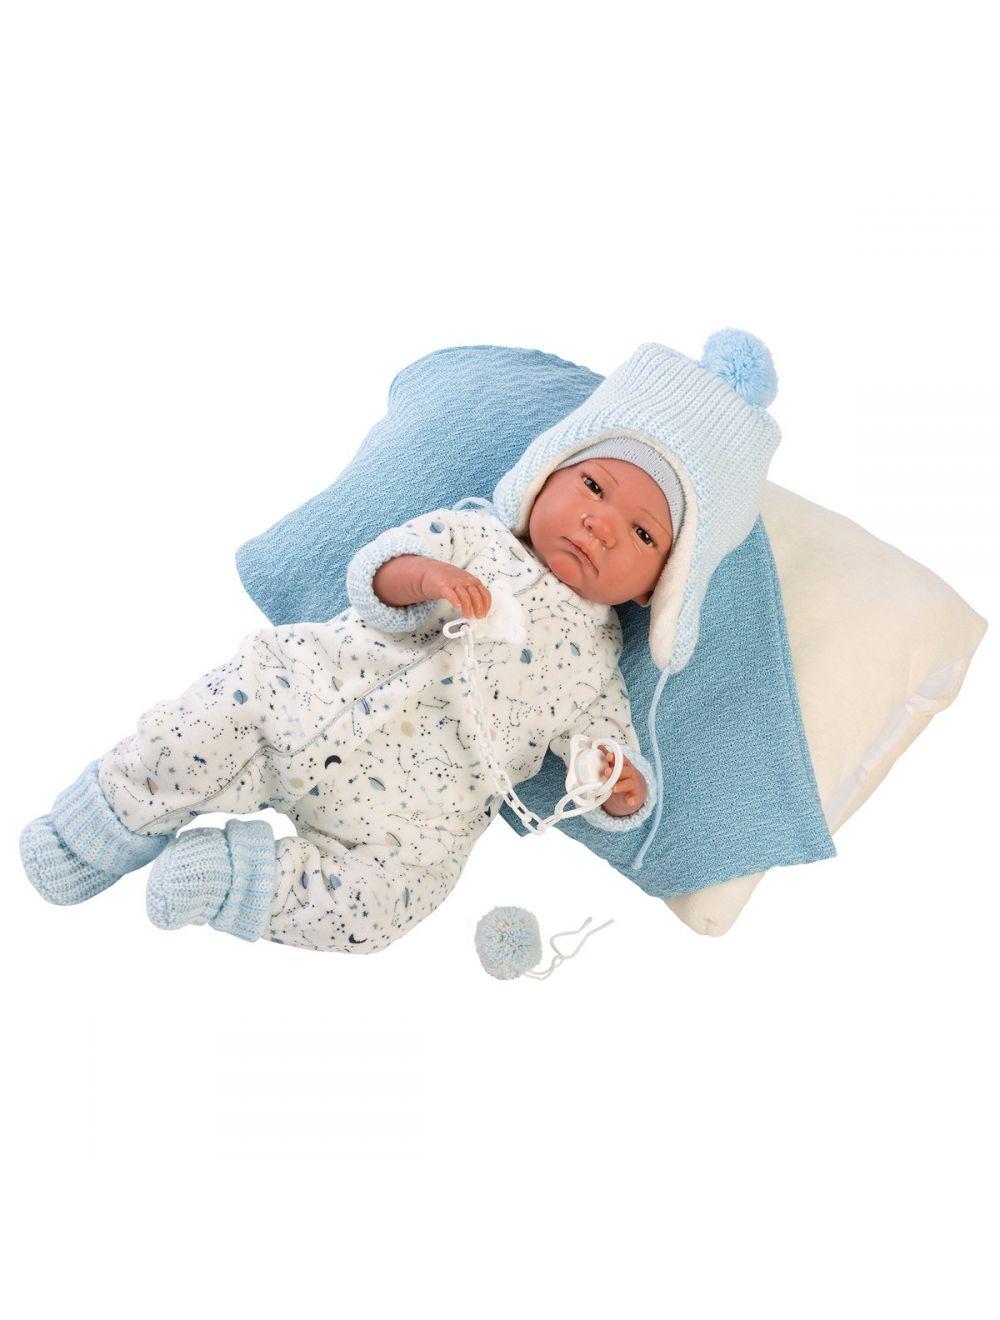 Llorens 18007 Lalka Reborn 42cm niebieski